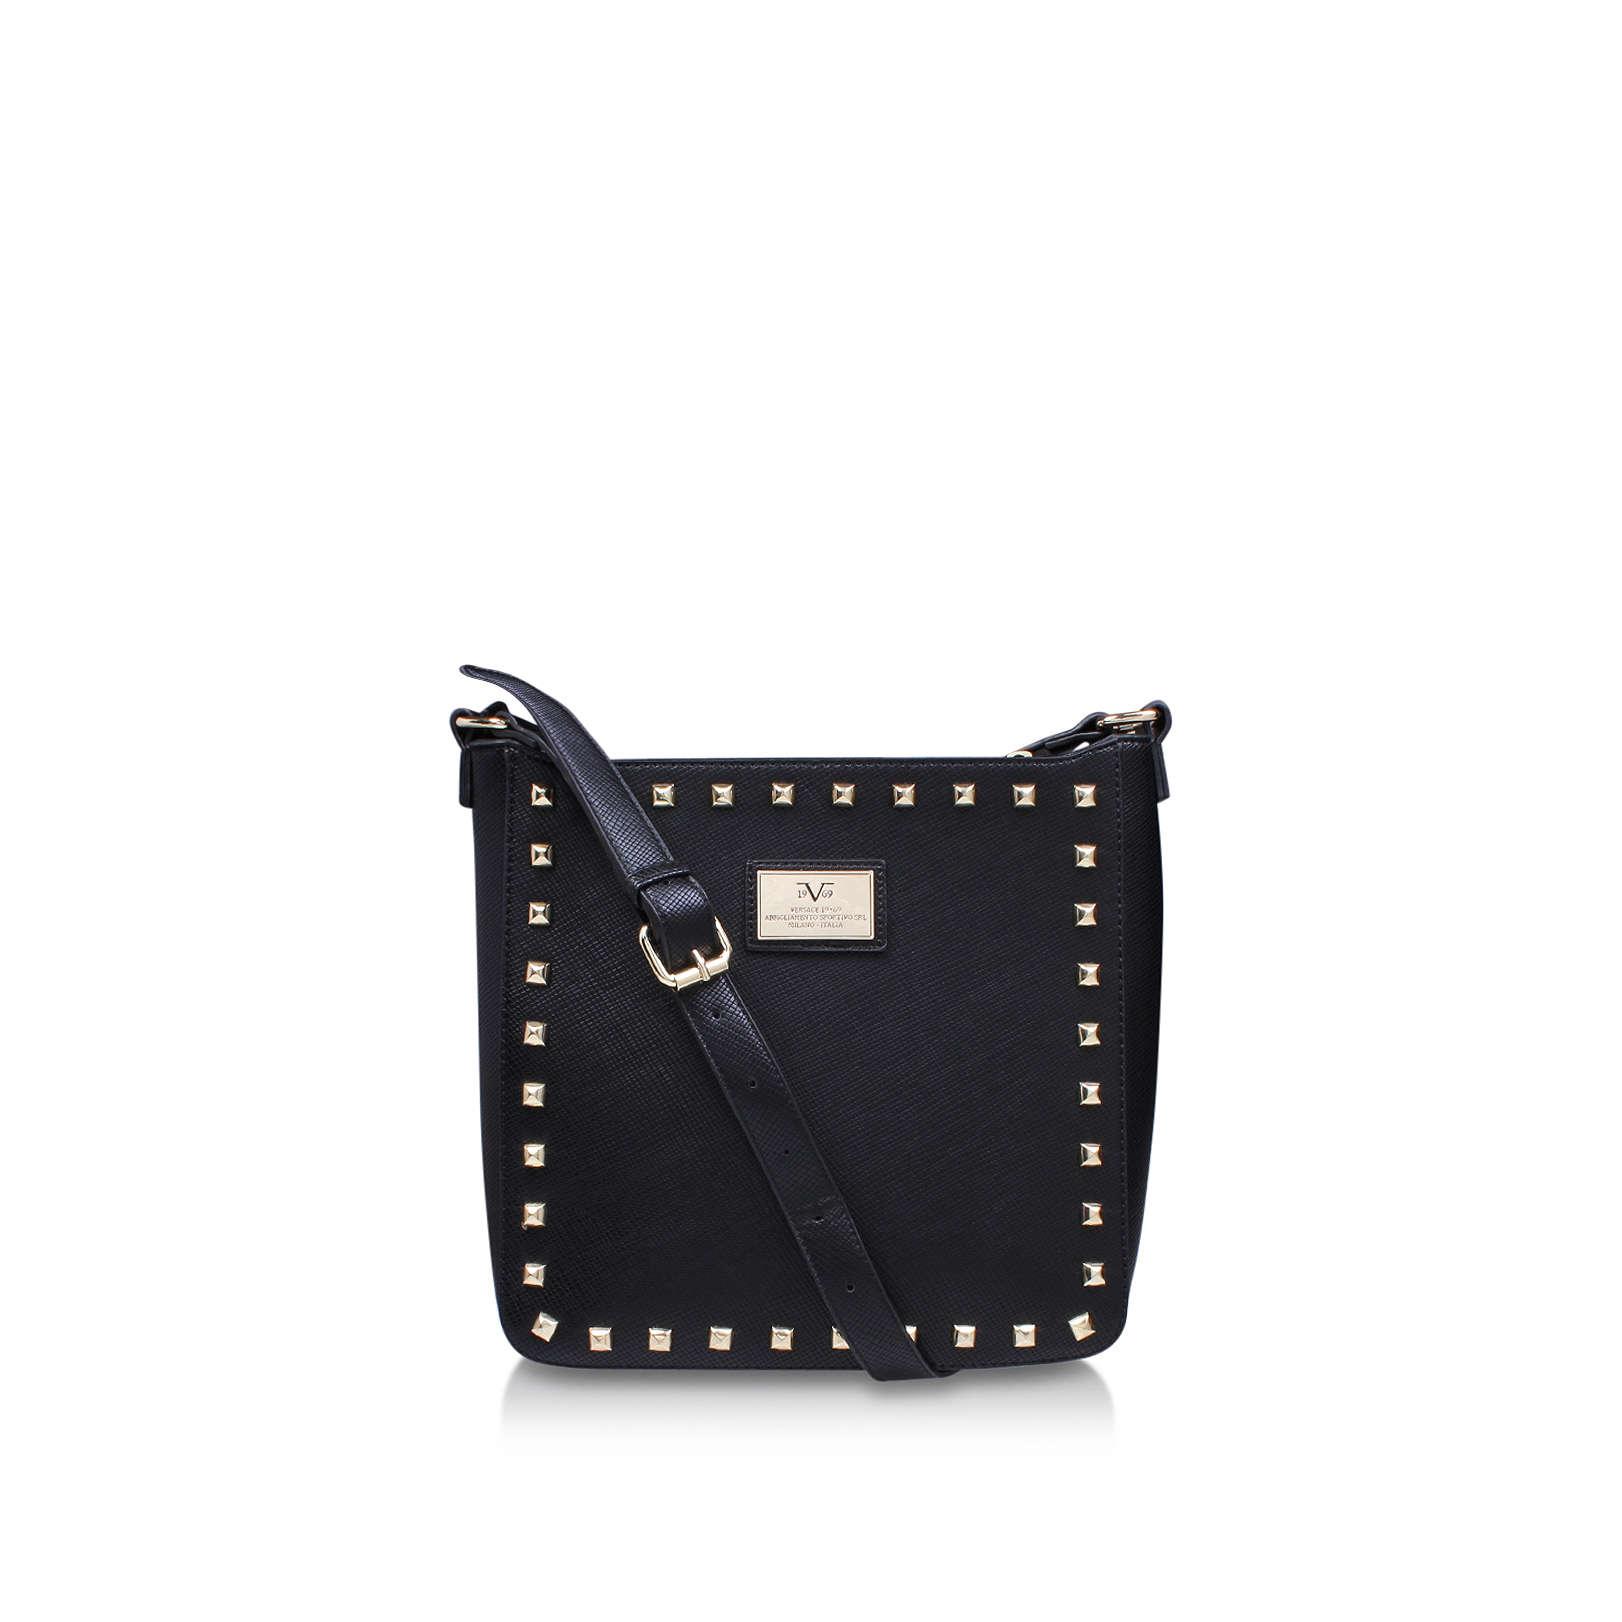 star versace 1969 star black handbag by versace 1969. Black Bedroom Furniture Sets. Home Design Ideas